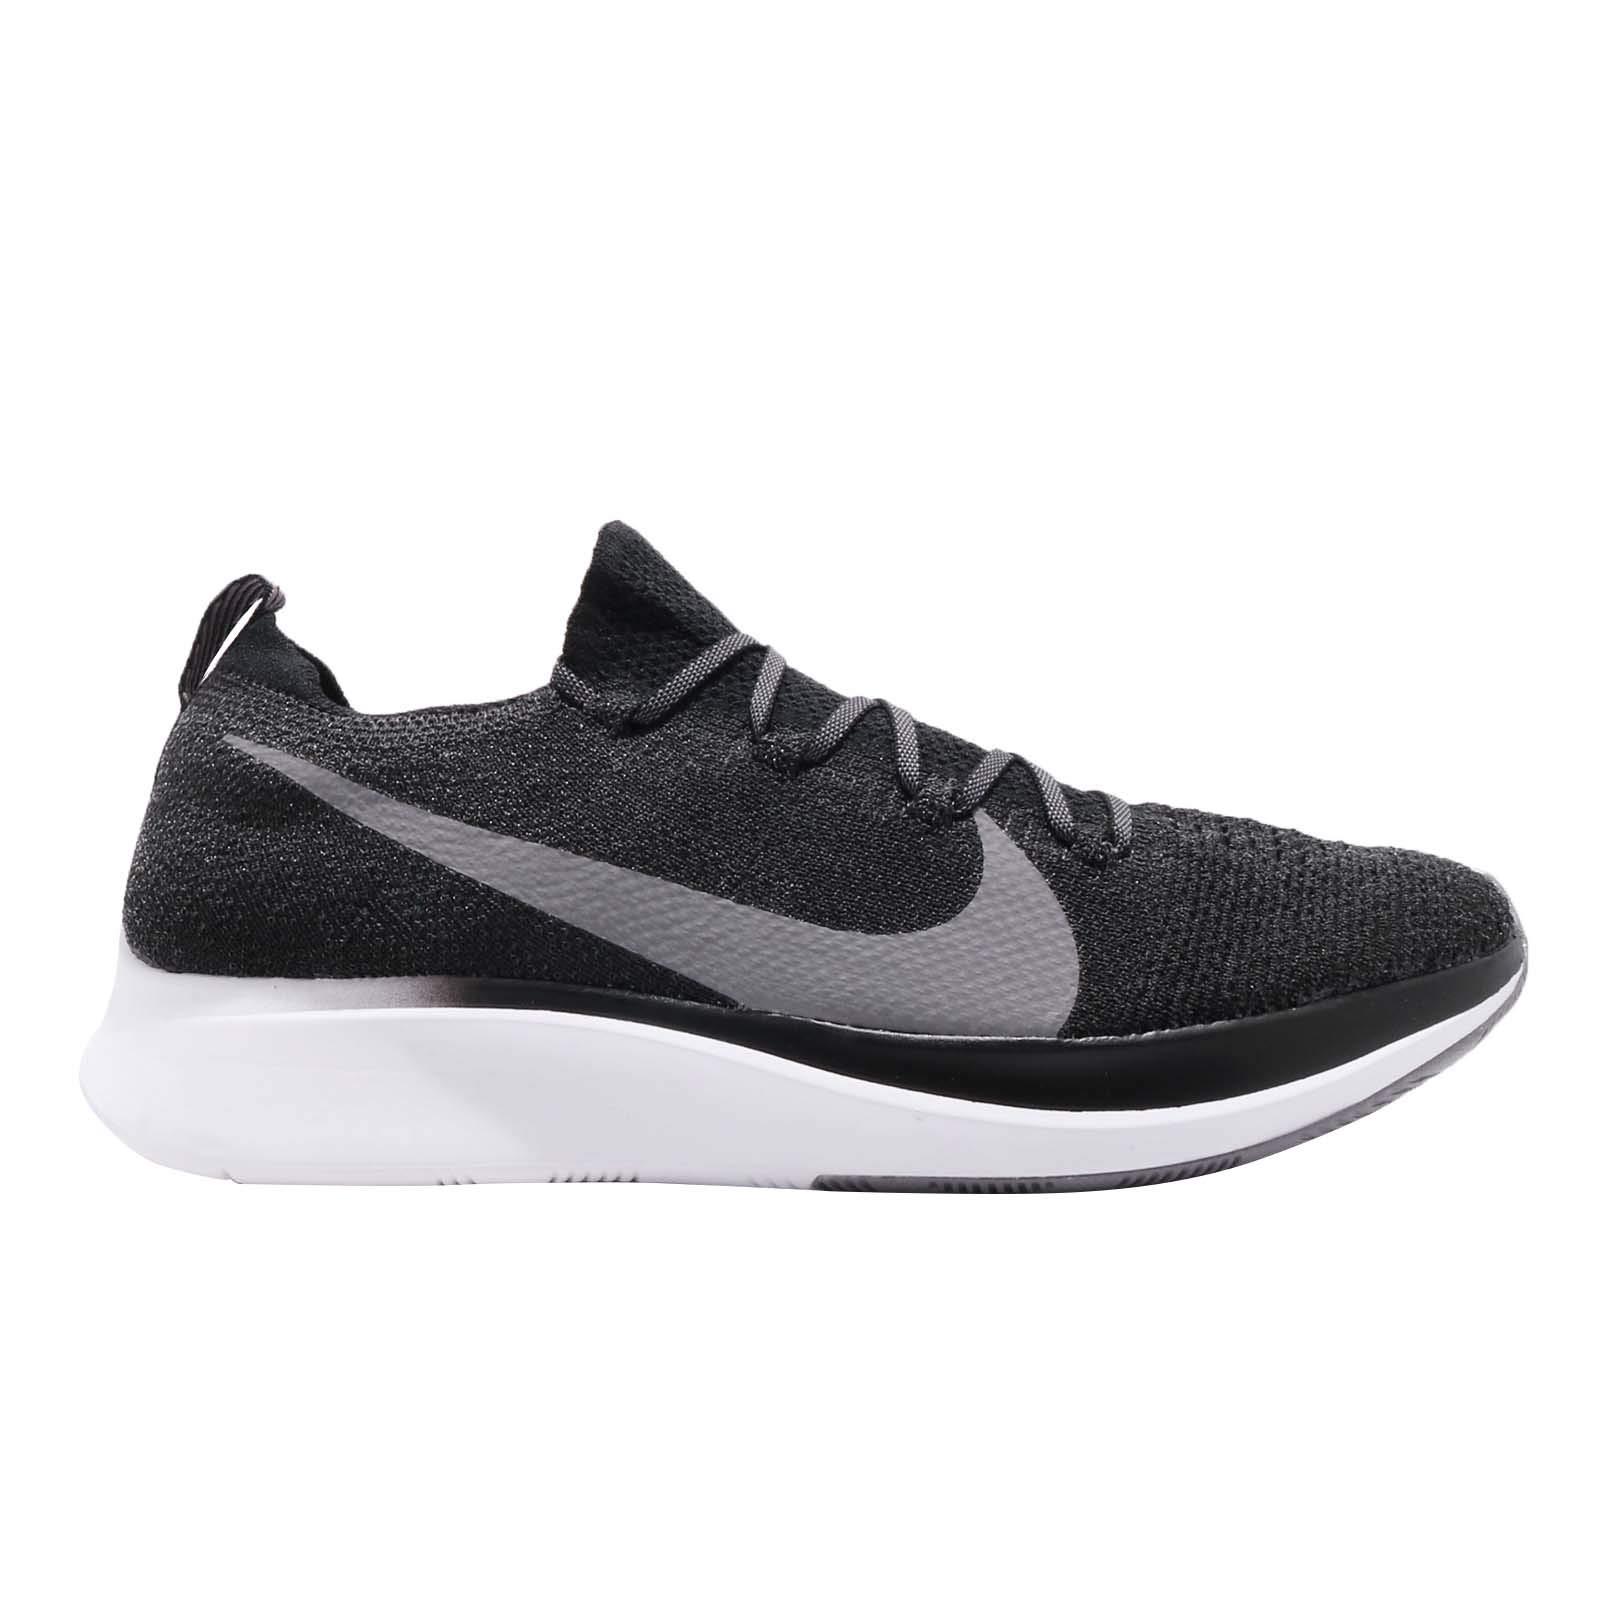 Nike Zoom Fly Flyknit Men's Running Shoe Black/Gunsmoke-White Size 7.5 by Nike (Image #5)